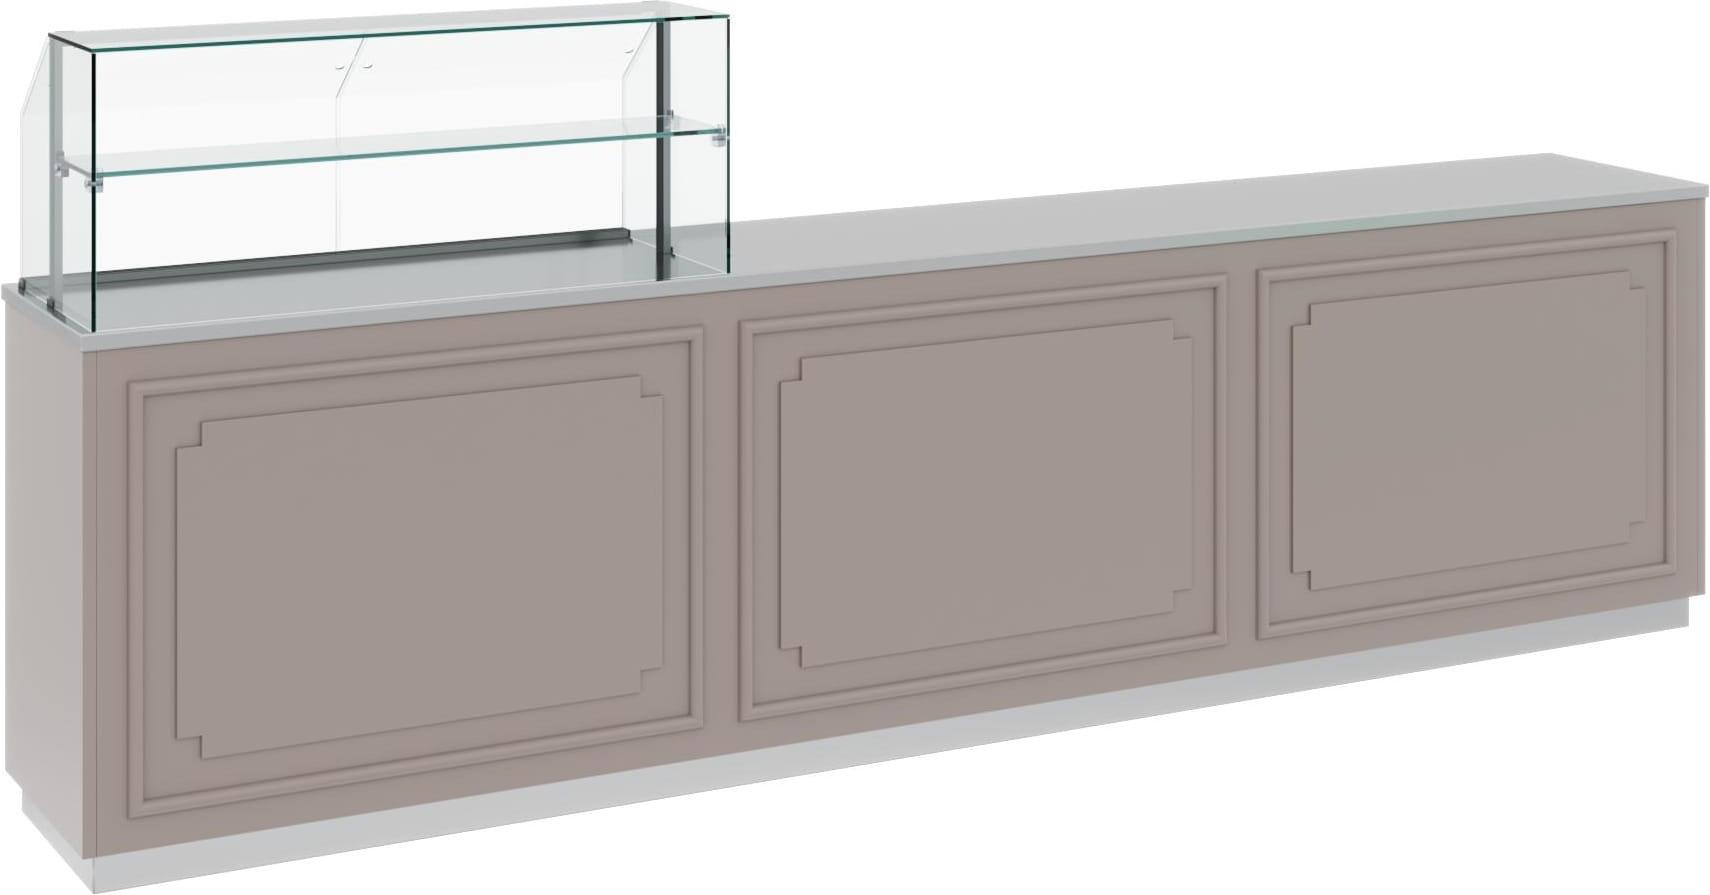 Нейтральная витрина CARBOMA OMI AC40N 2.0-11 - 1